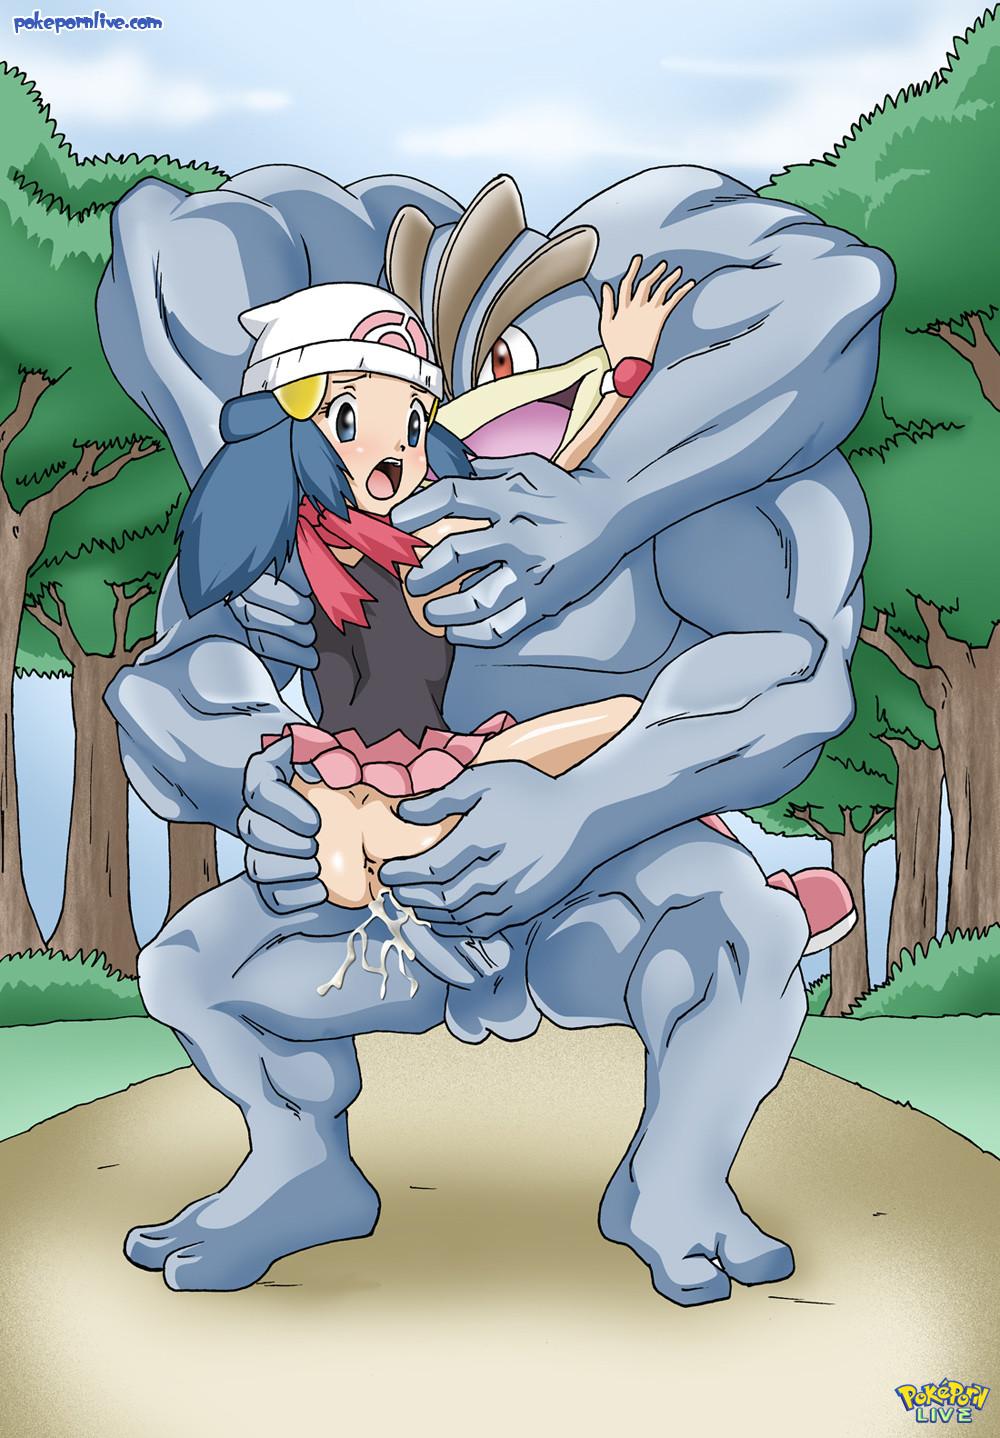 pokemon-has-sex-his-dick-my-wife-cum-lover